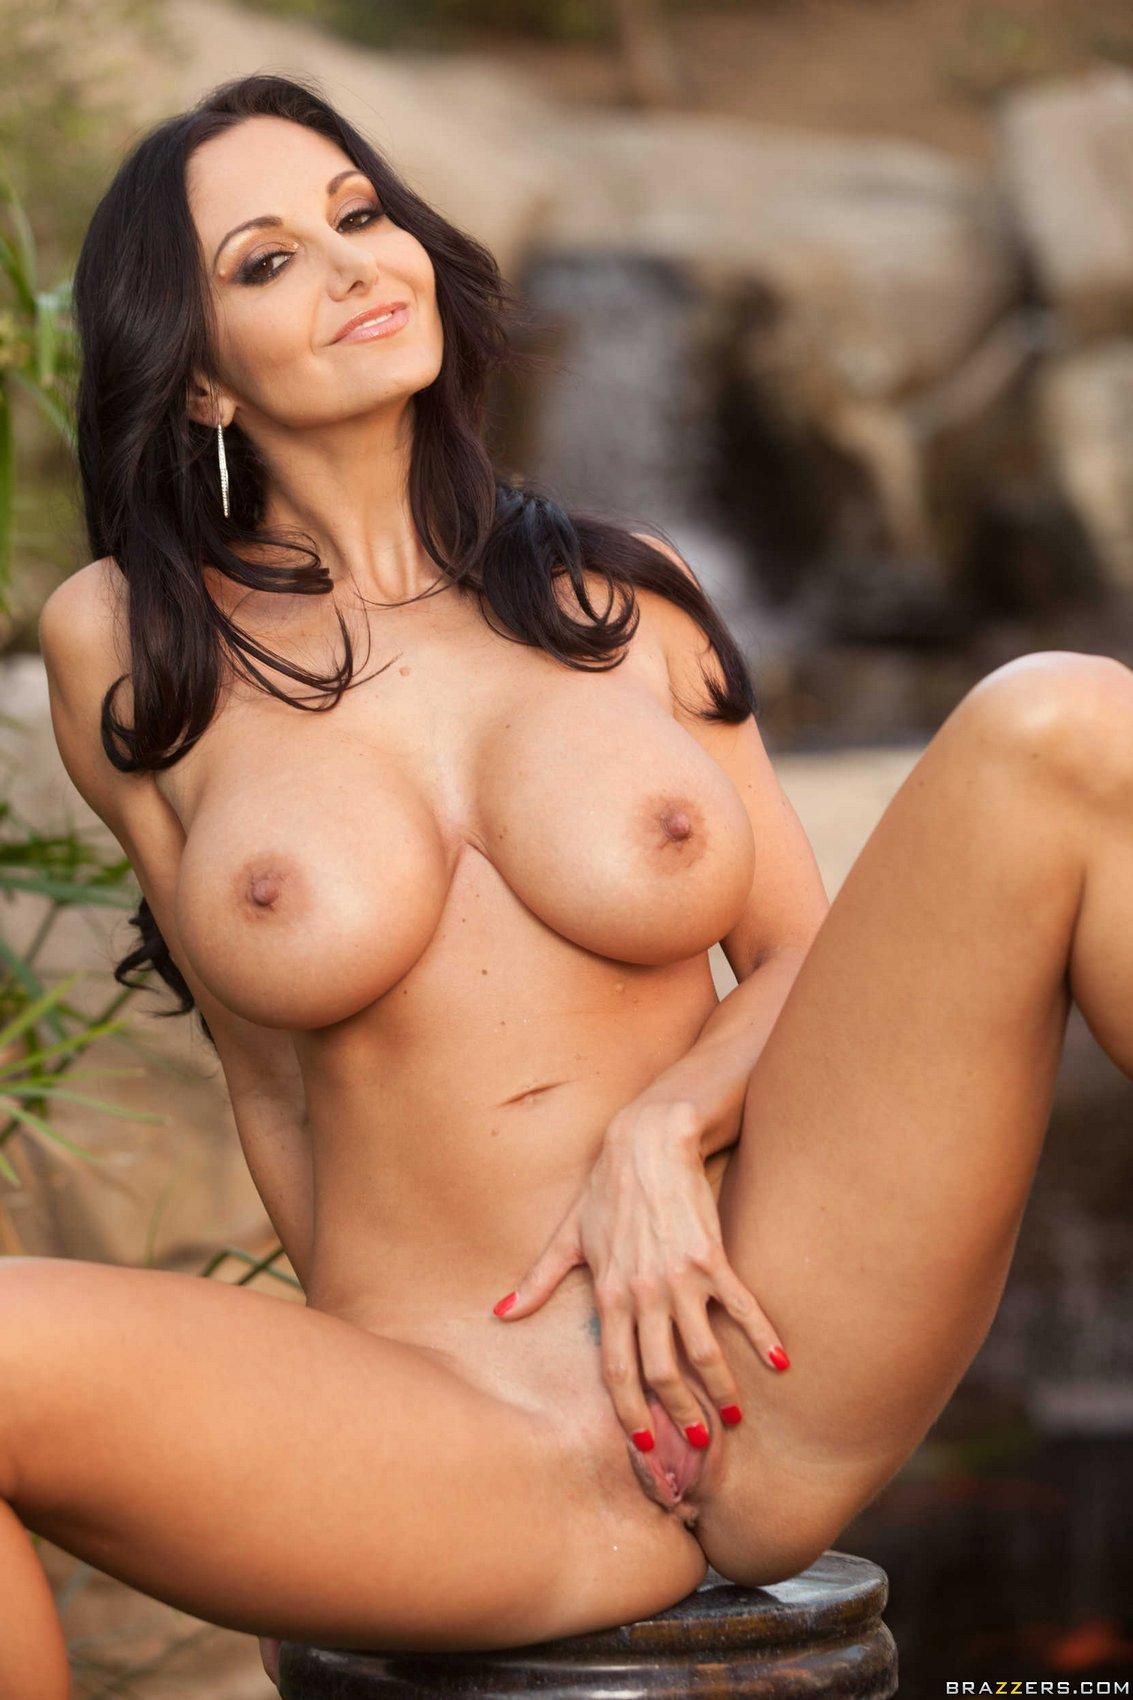 Ava addams boobs